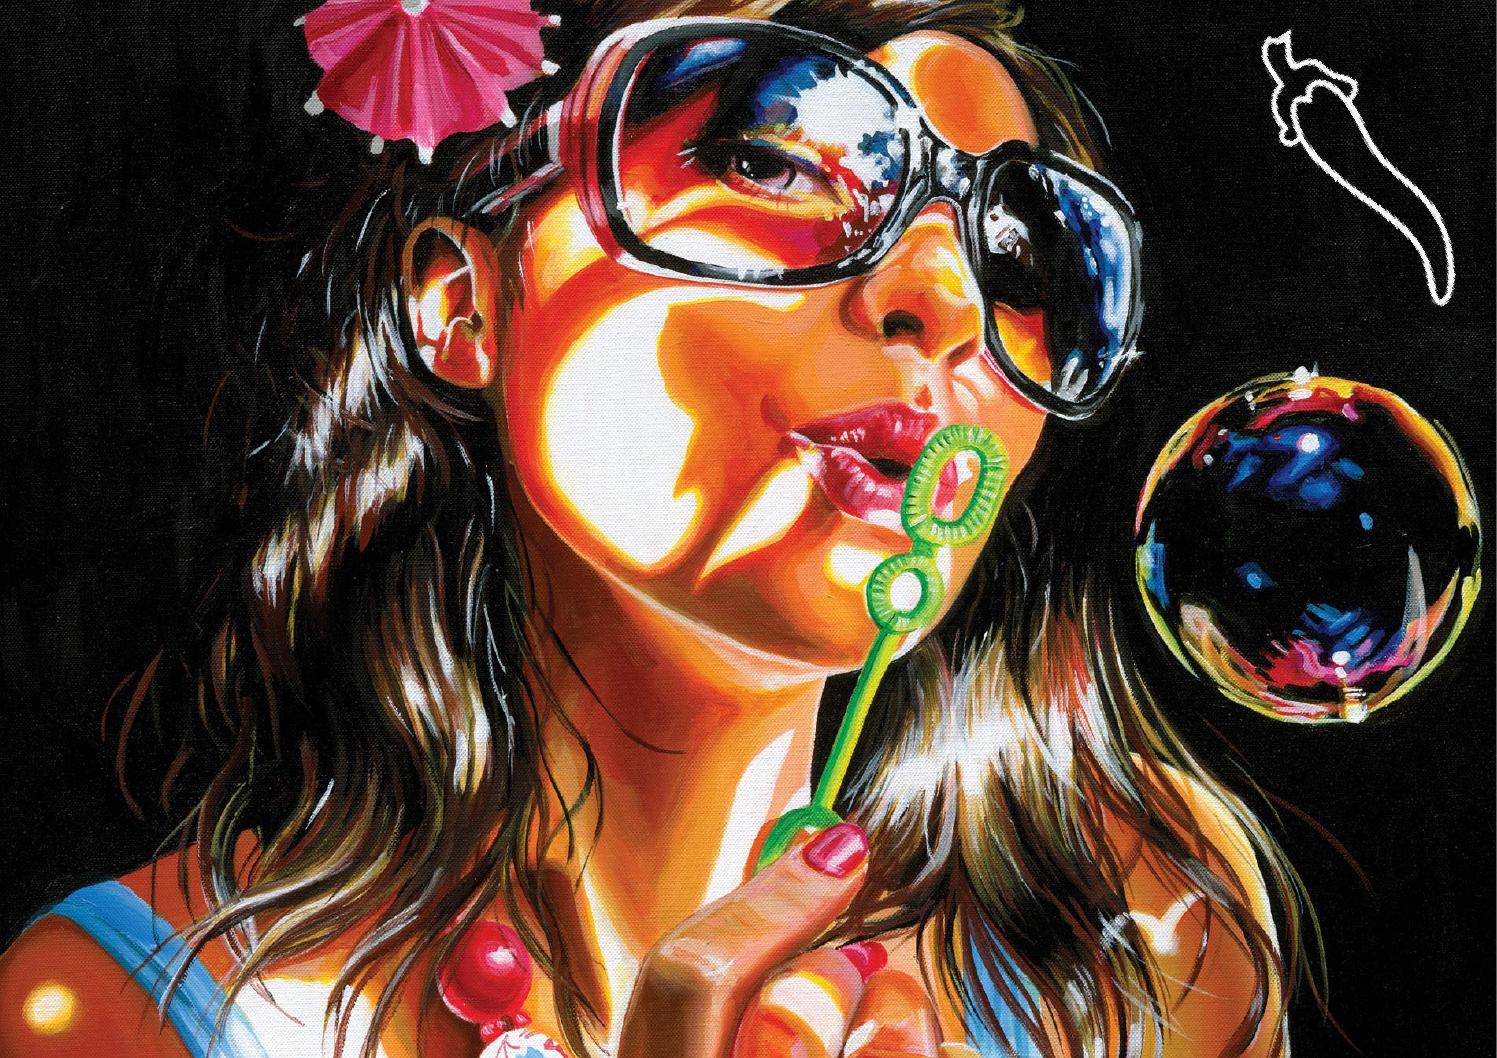 Book final Chilli Beans - sem corte by Ananda Trigo - issuu 83831a9a5c